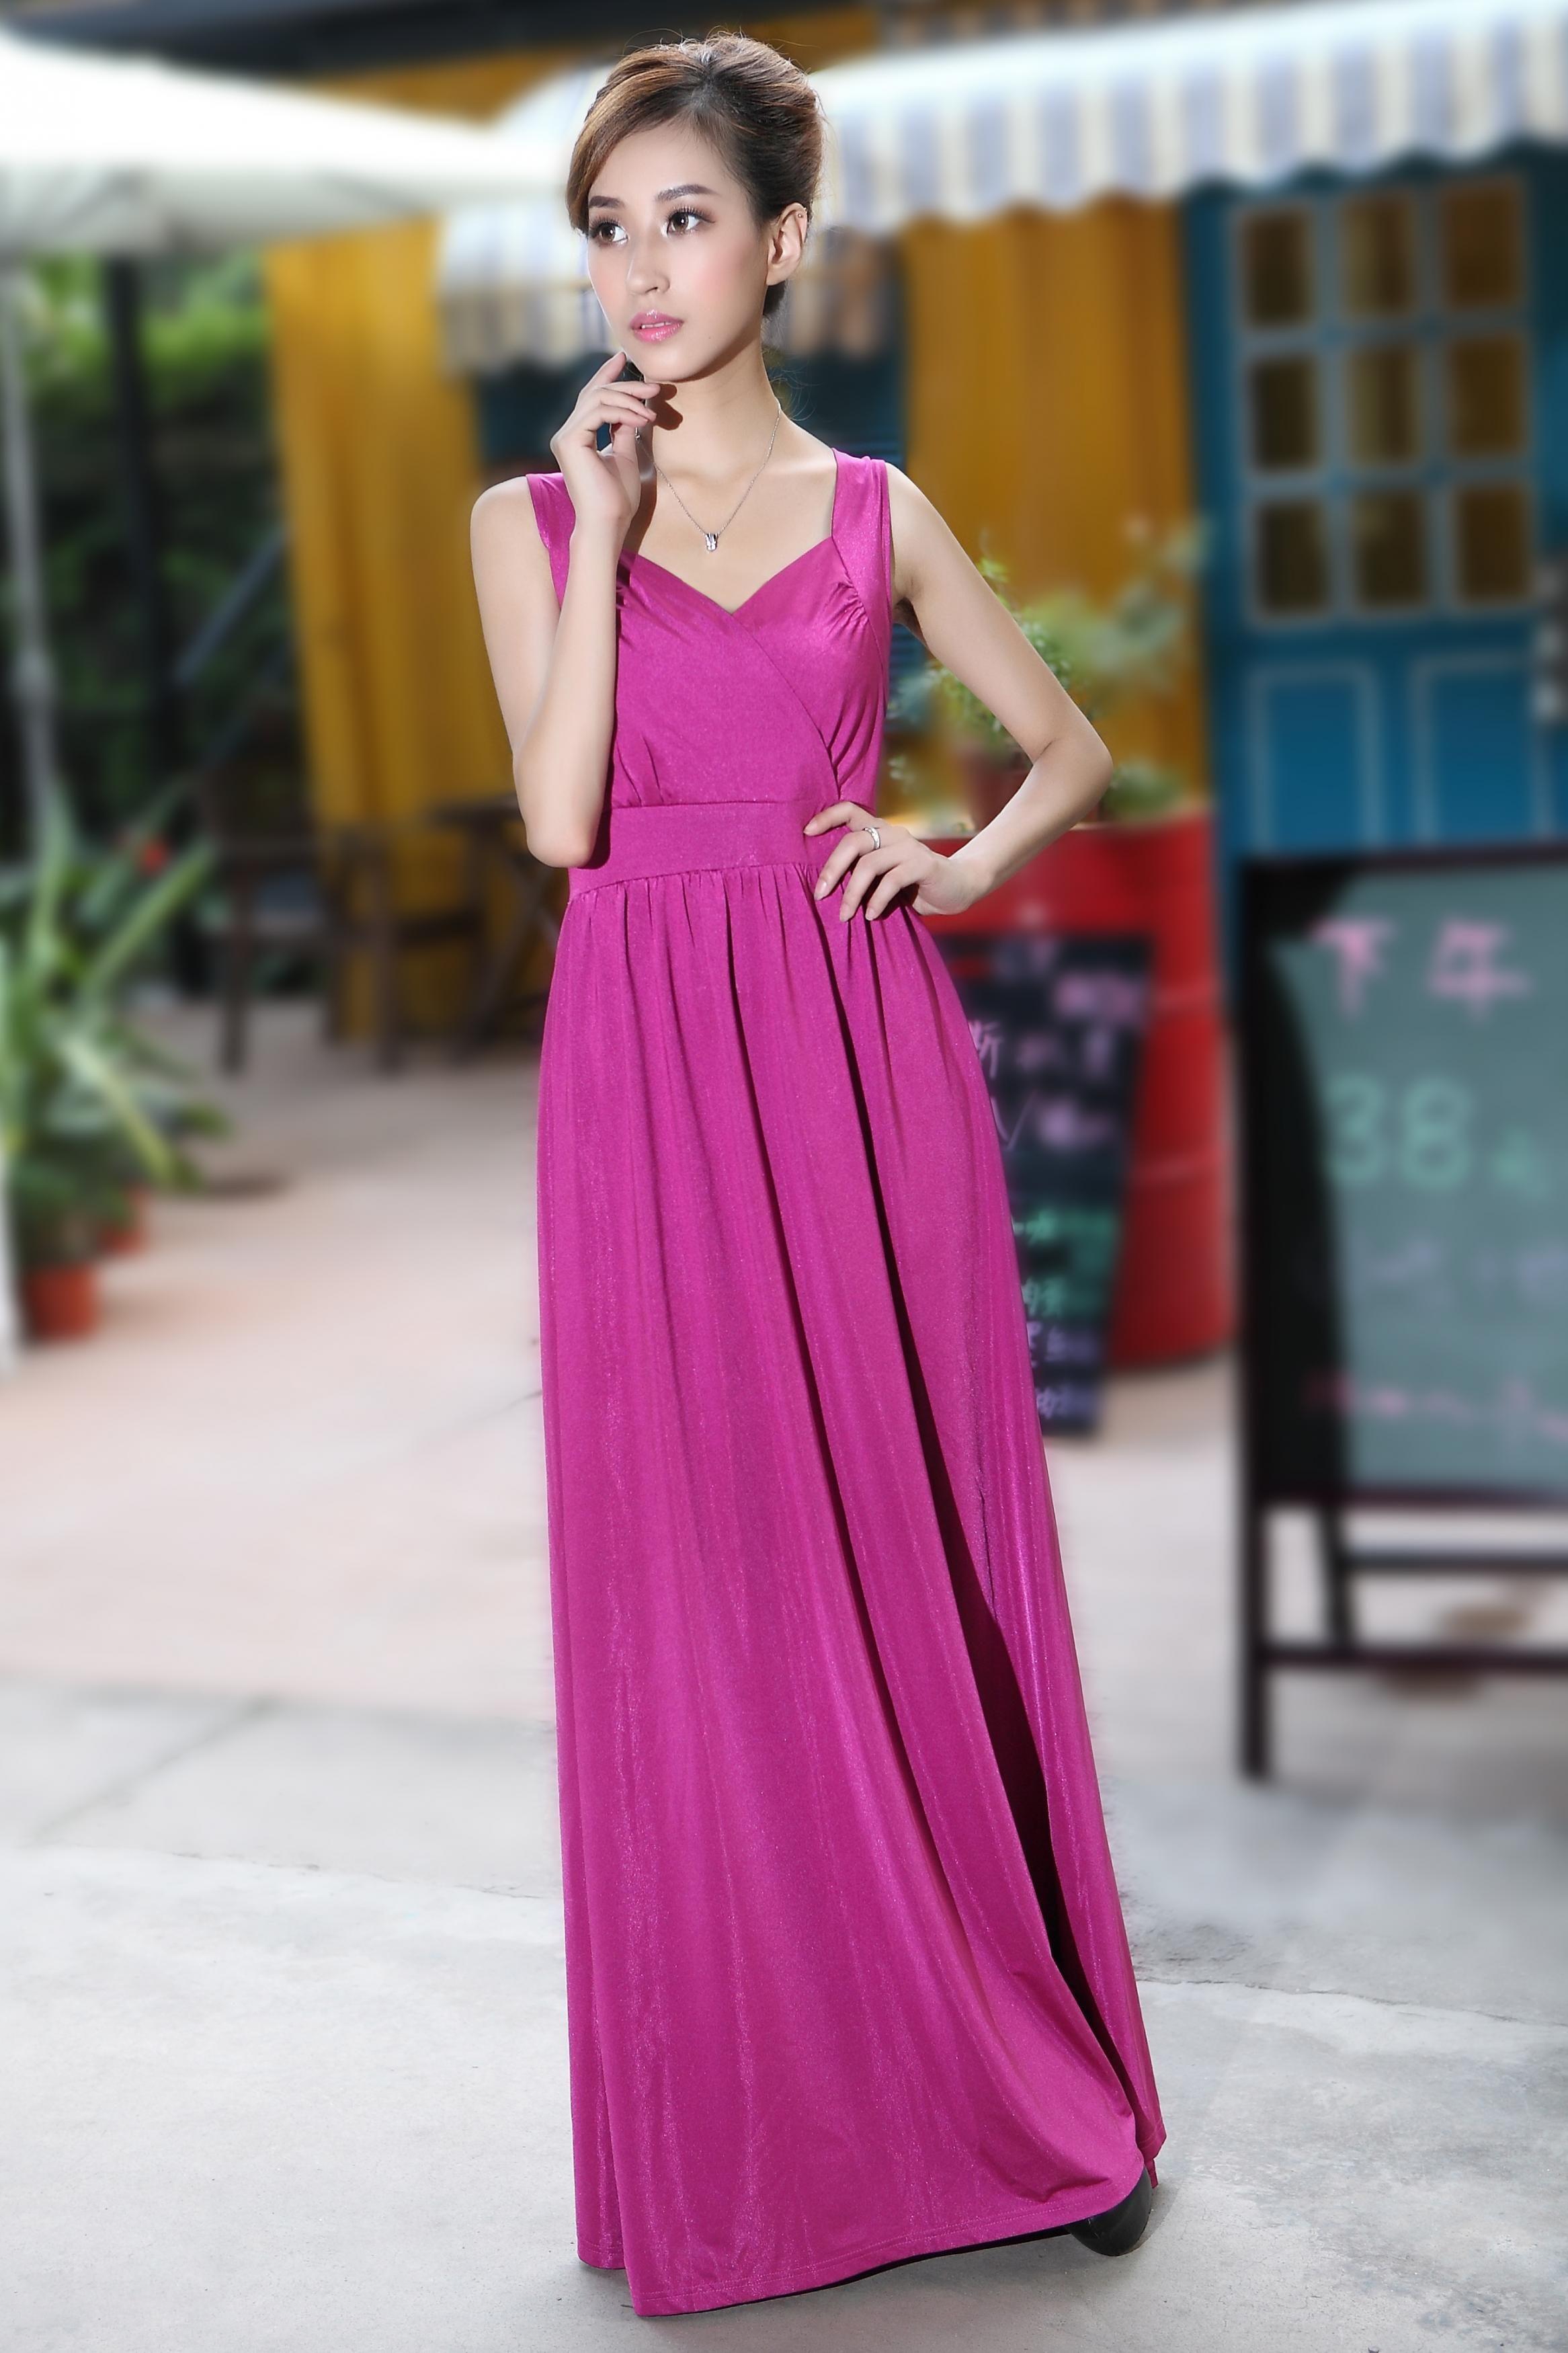 Under 30 Age Women Party Dresses Exclusive | Under 30 Age Women ...